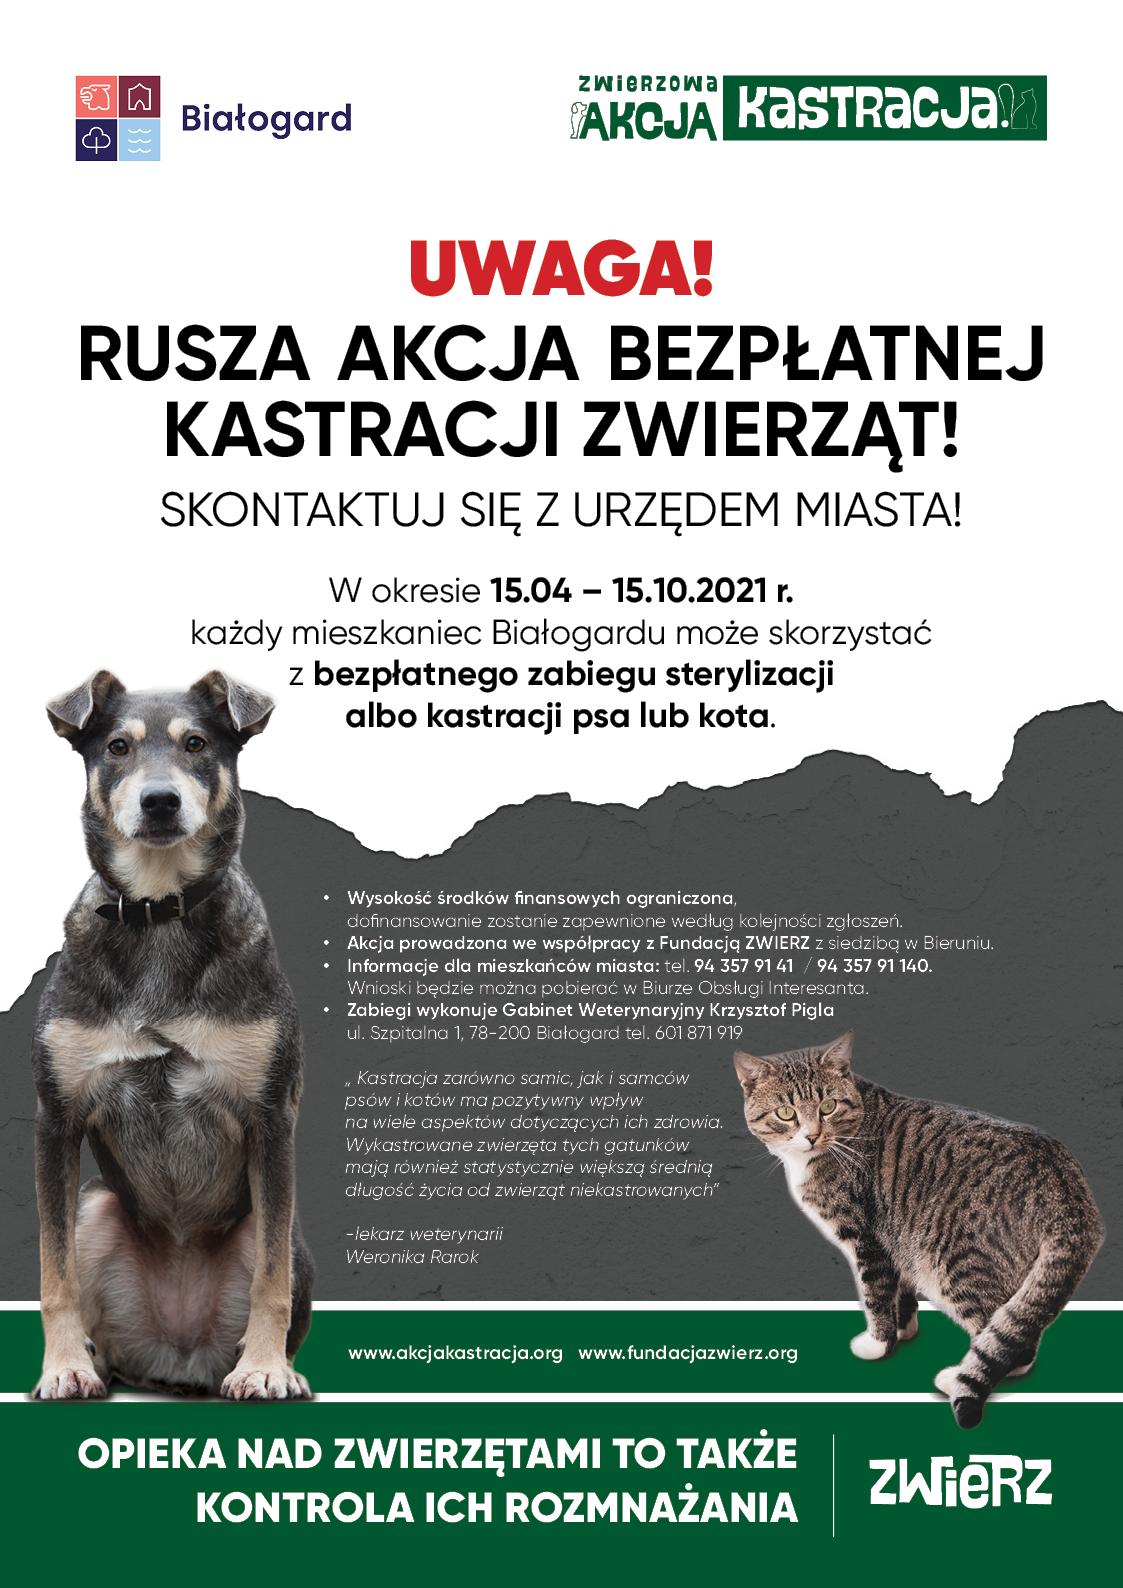 akcja-kastracja-plakat-A3-Bialogard-fb